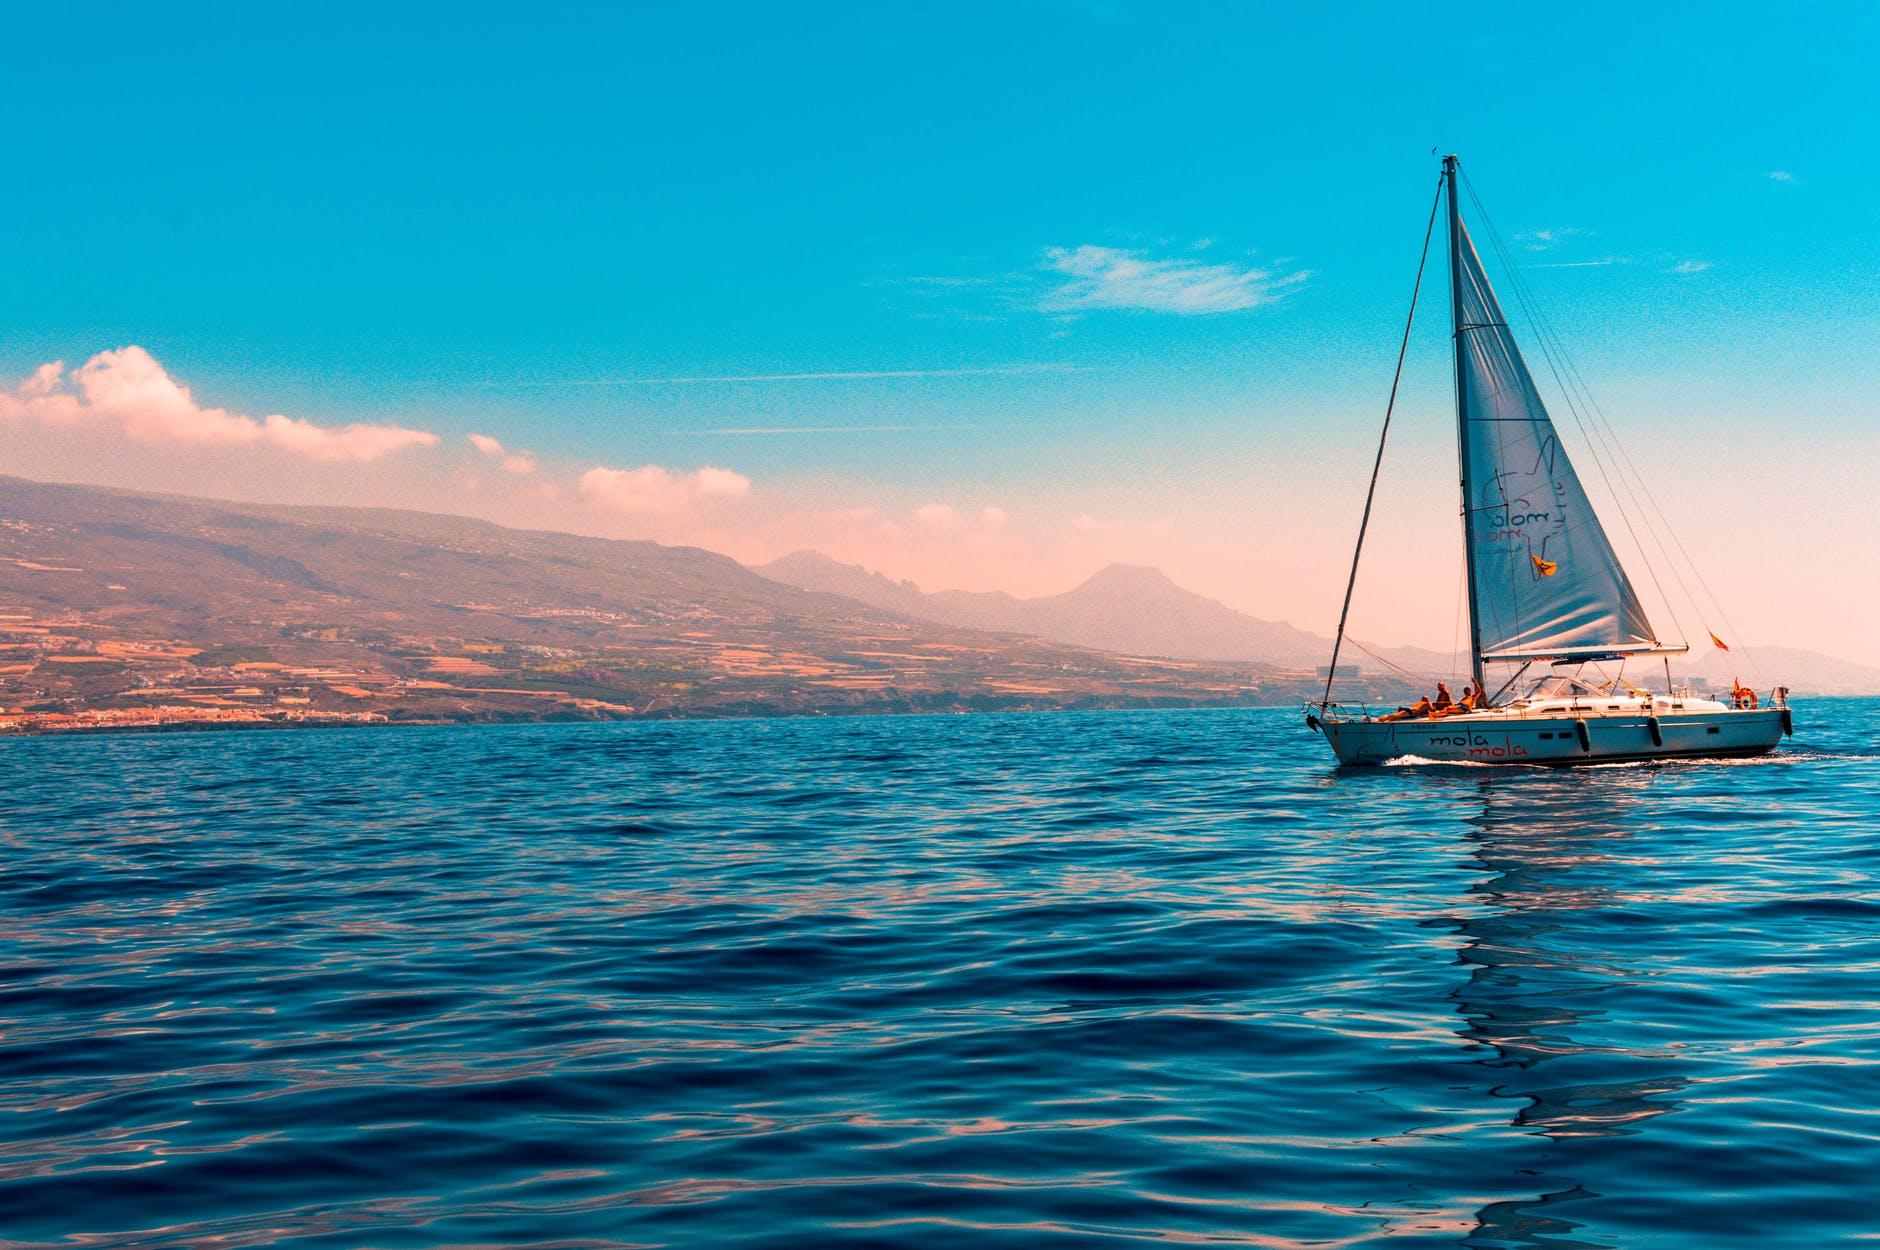 sailboat sailing on water near island